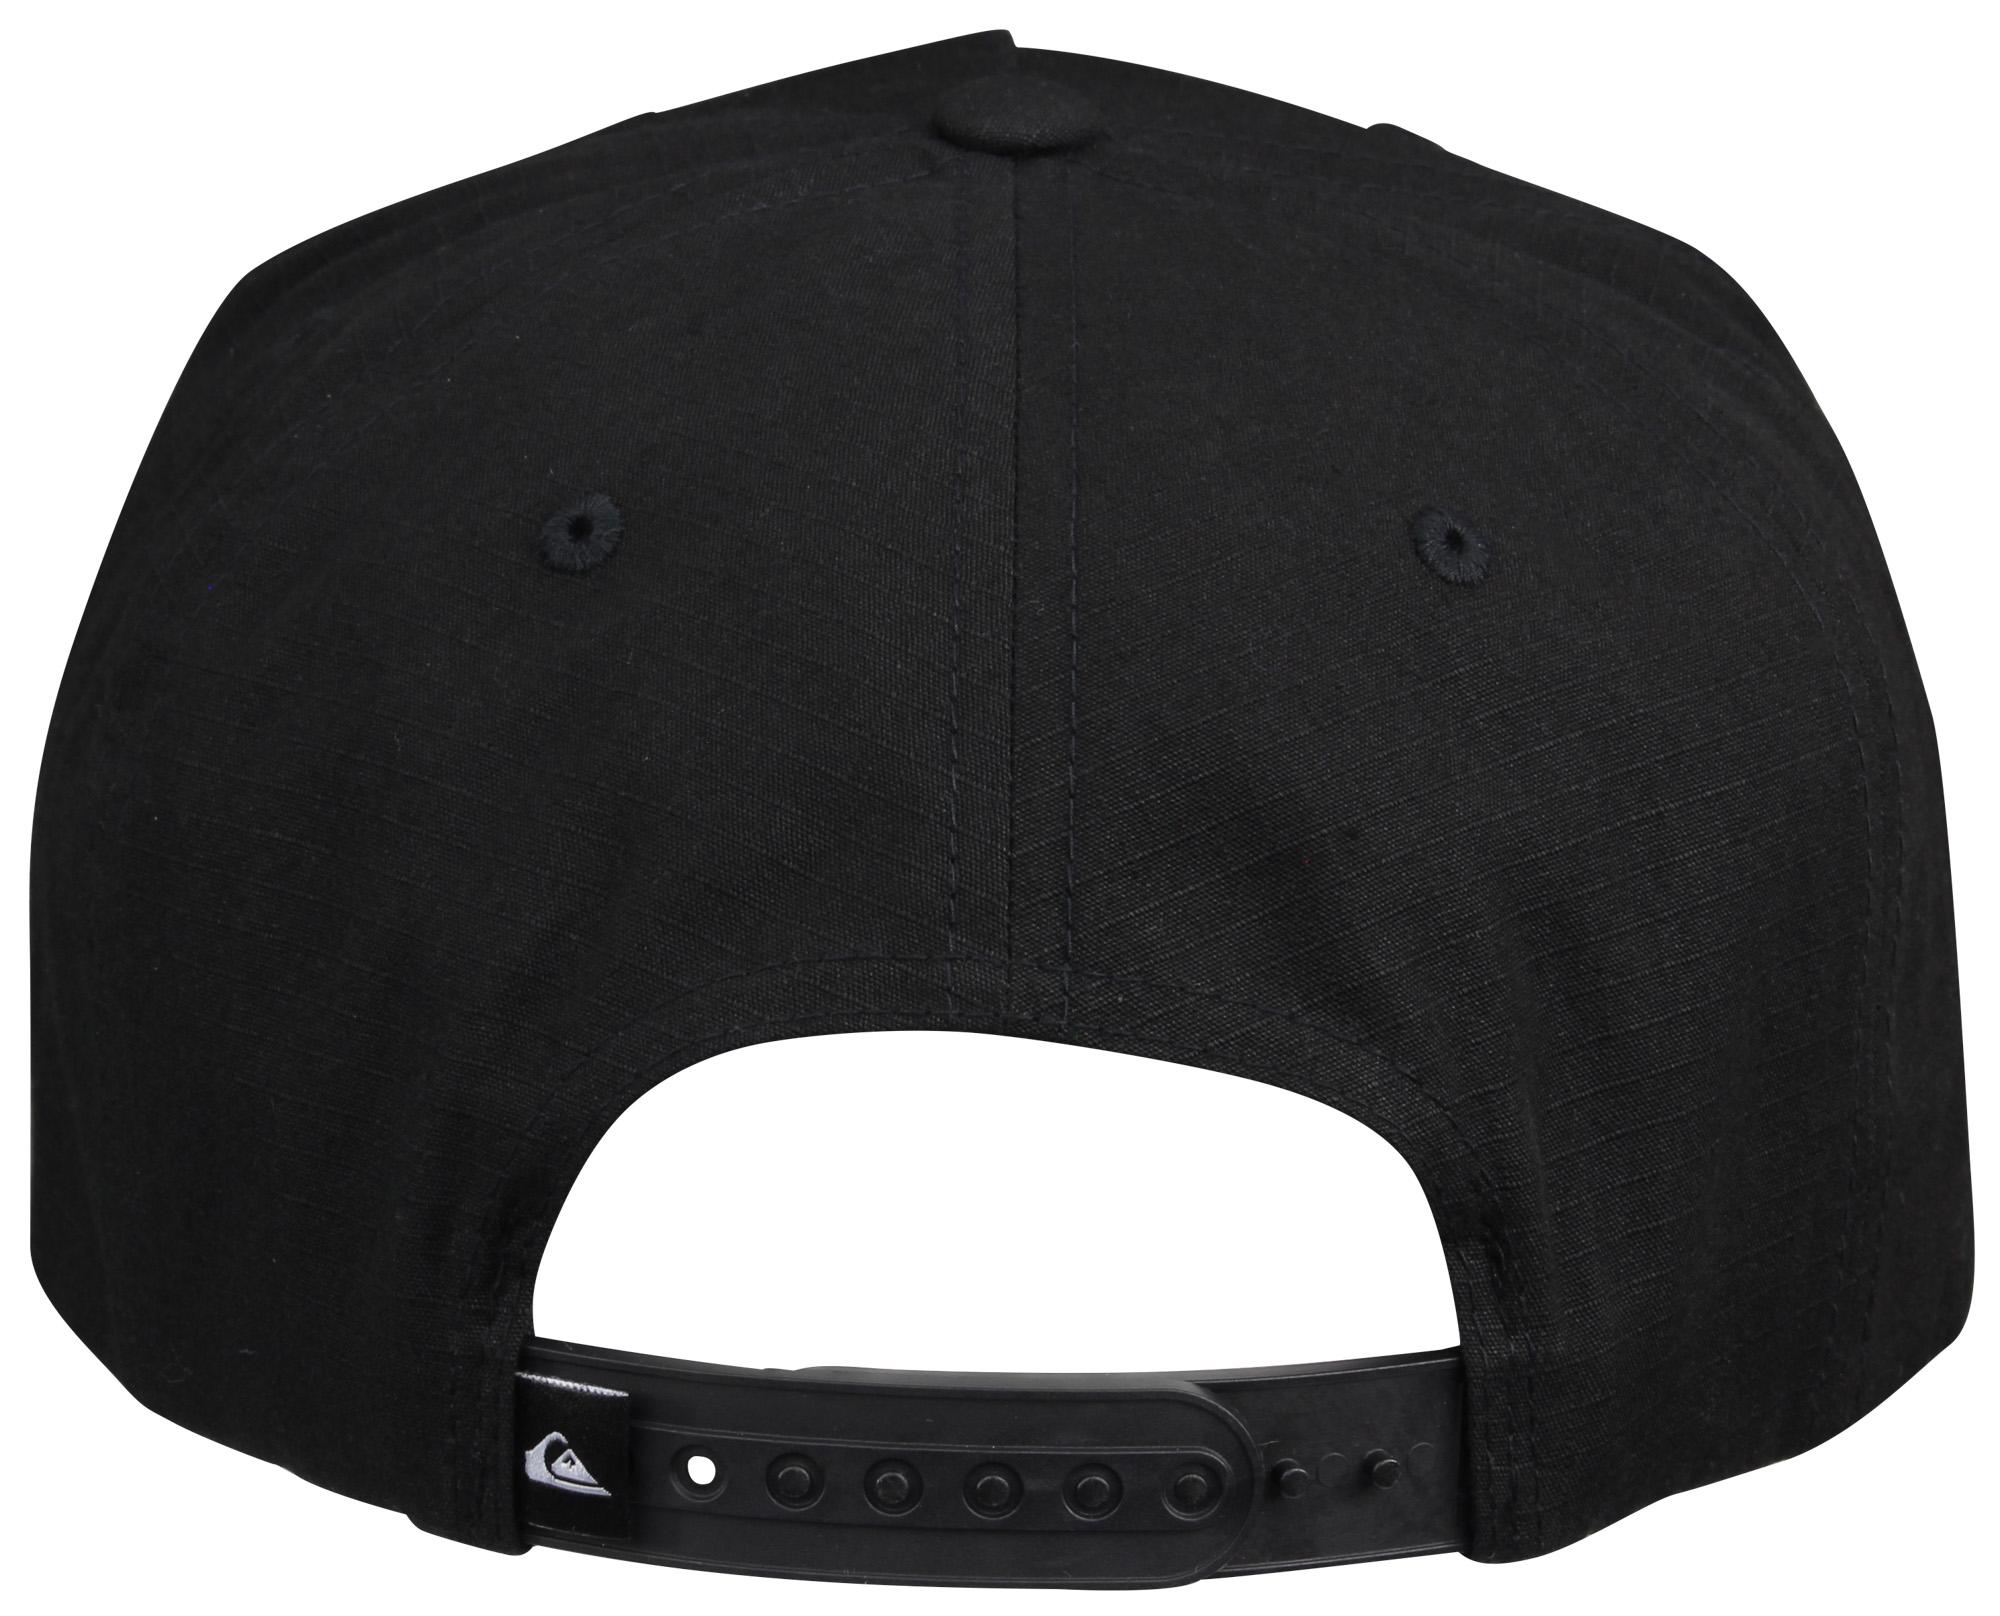 reputable site 3d9e6 4681f Quiksilver Tonal Pride Snapback Hat (Black) 4 4 of 5 ...